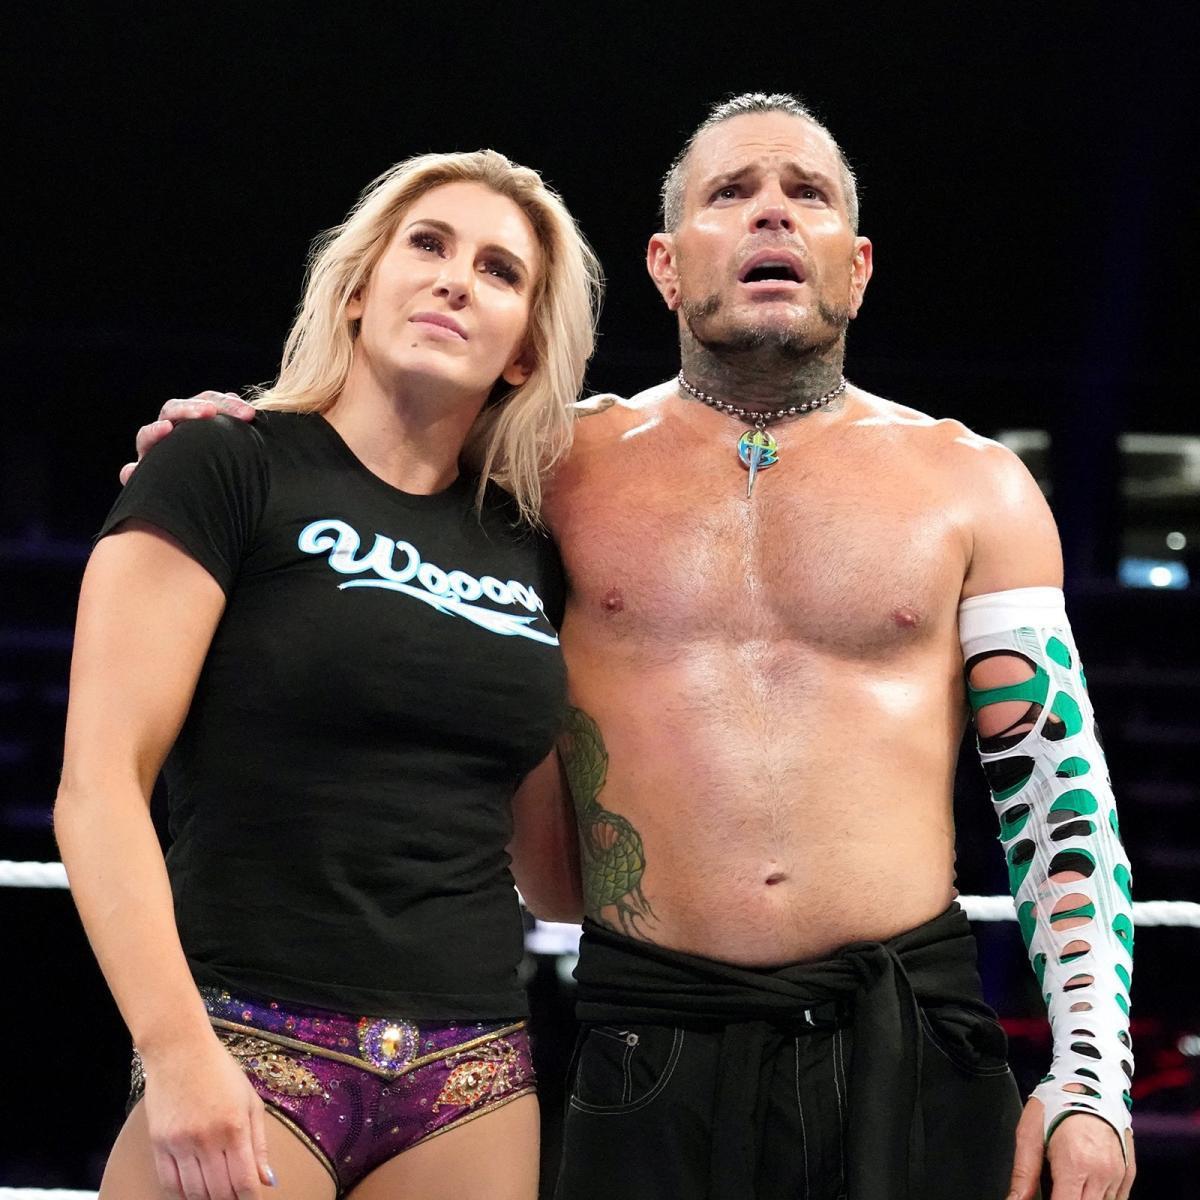 Jeff Hardy & Charlotte Flair